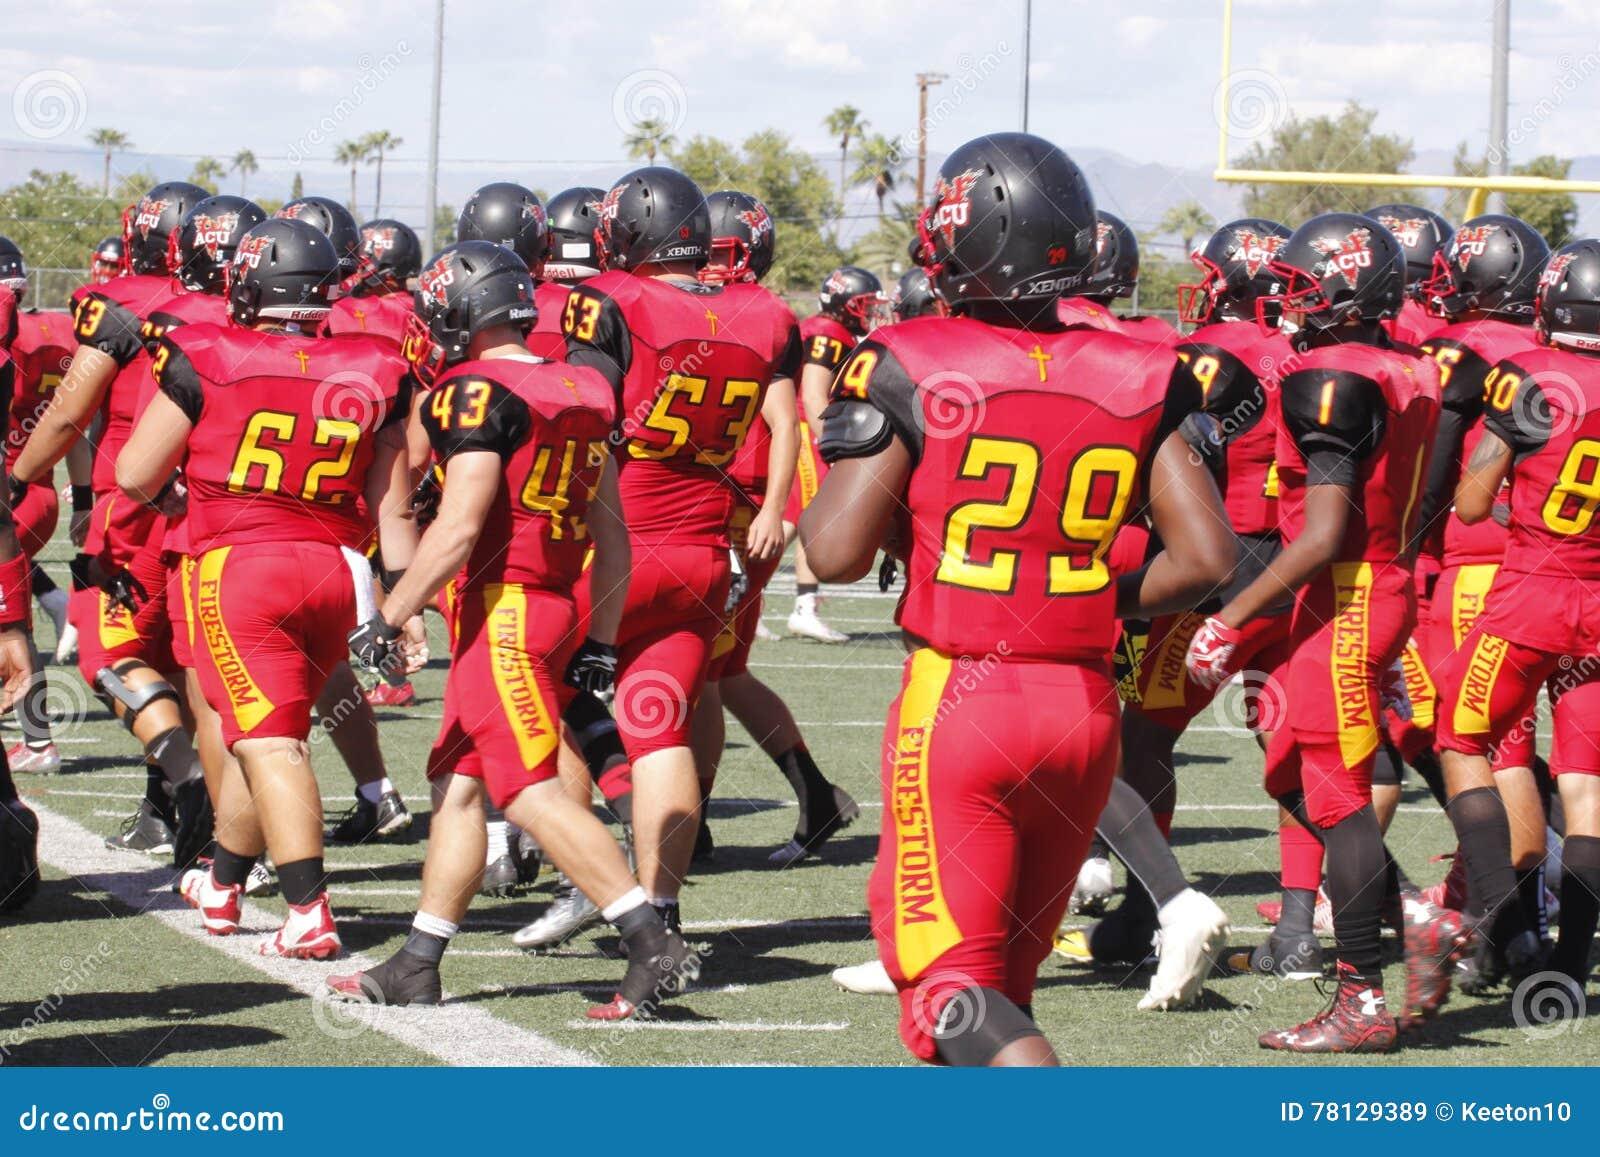 Arizona Christian University Football >> Arizona Christian University Football Editorial Stock Image